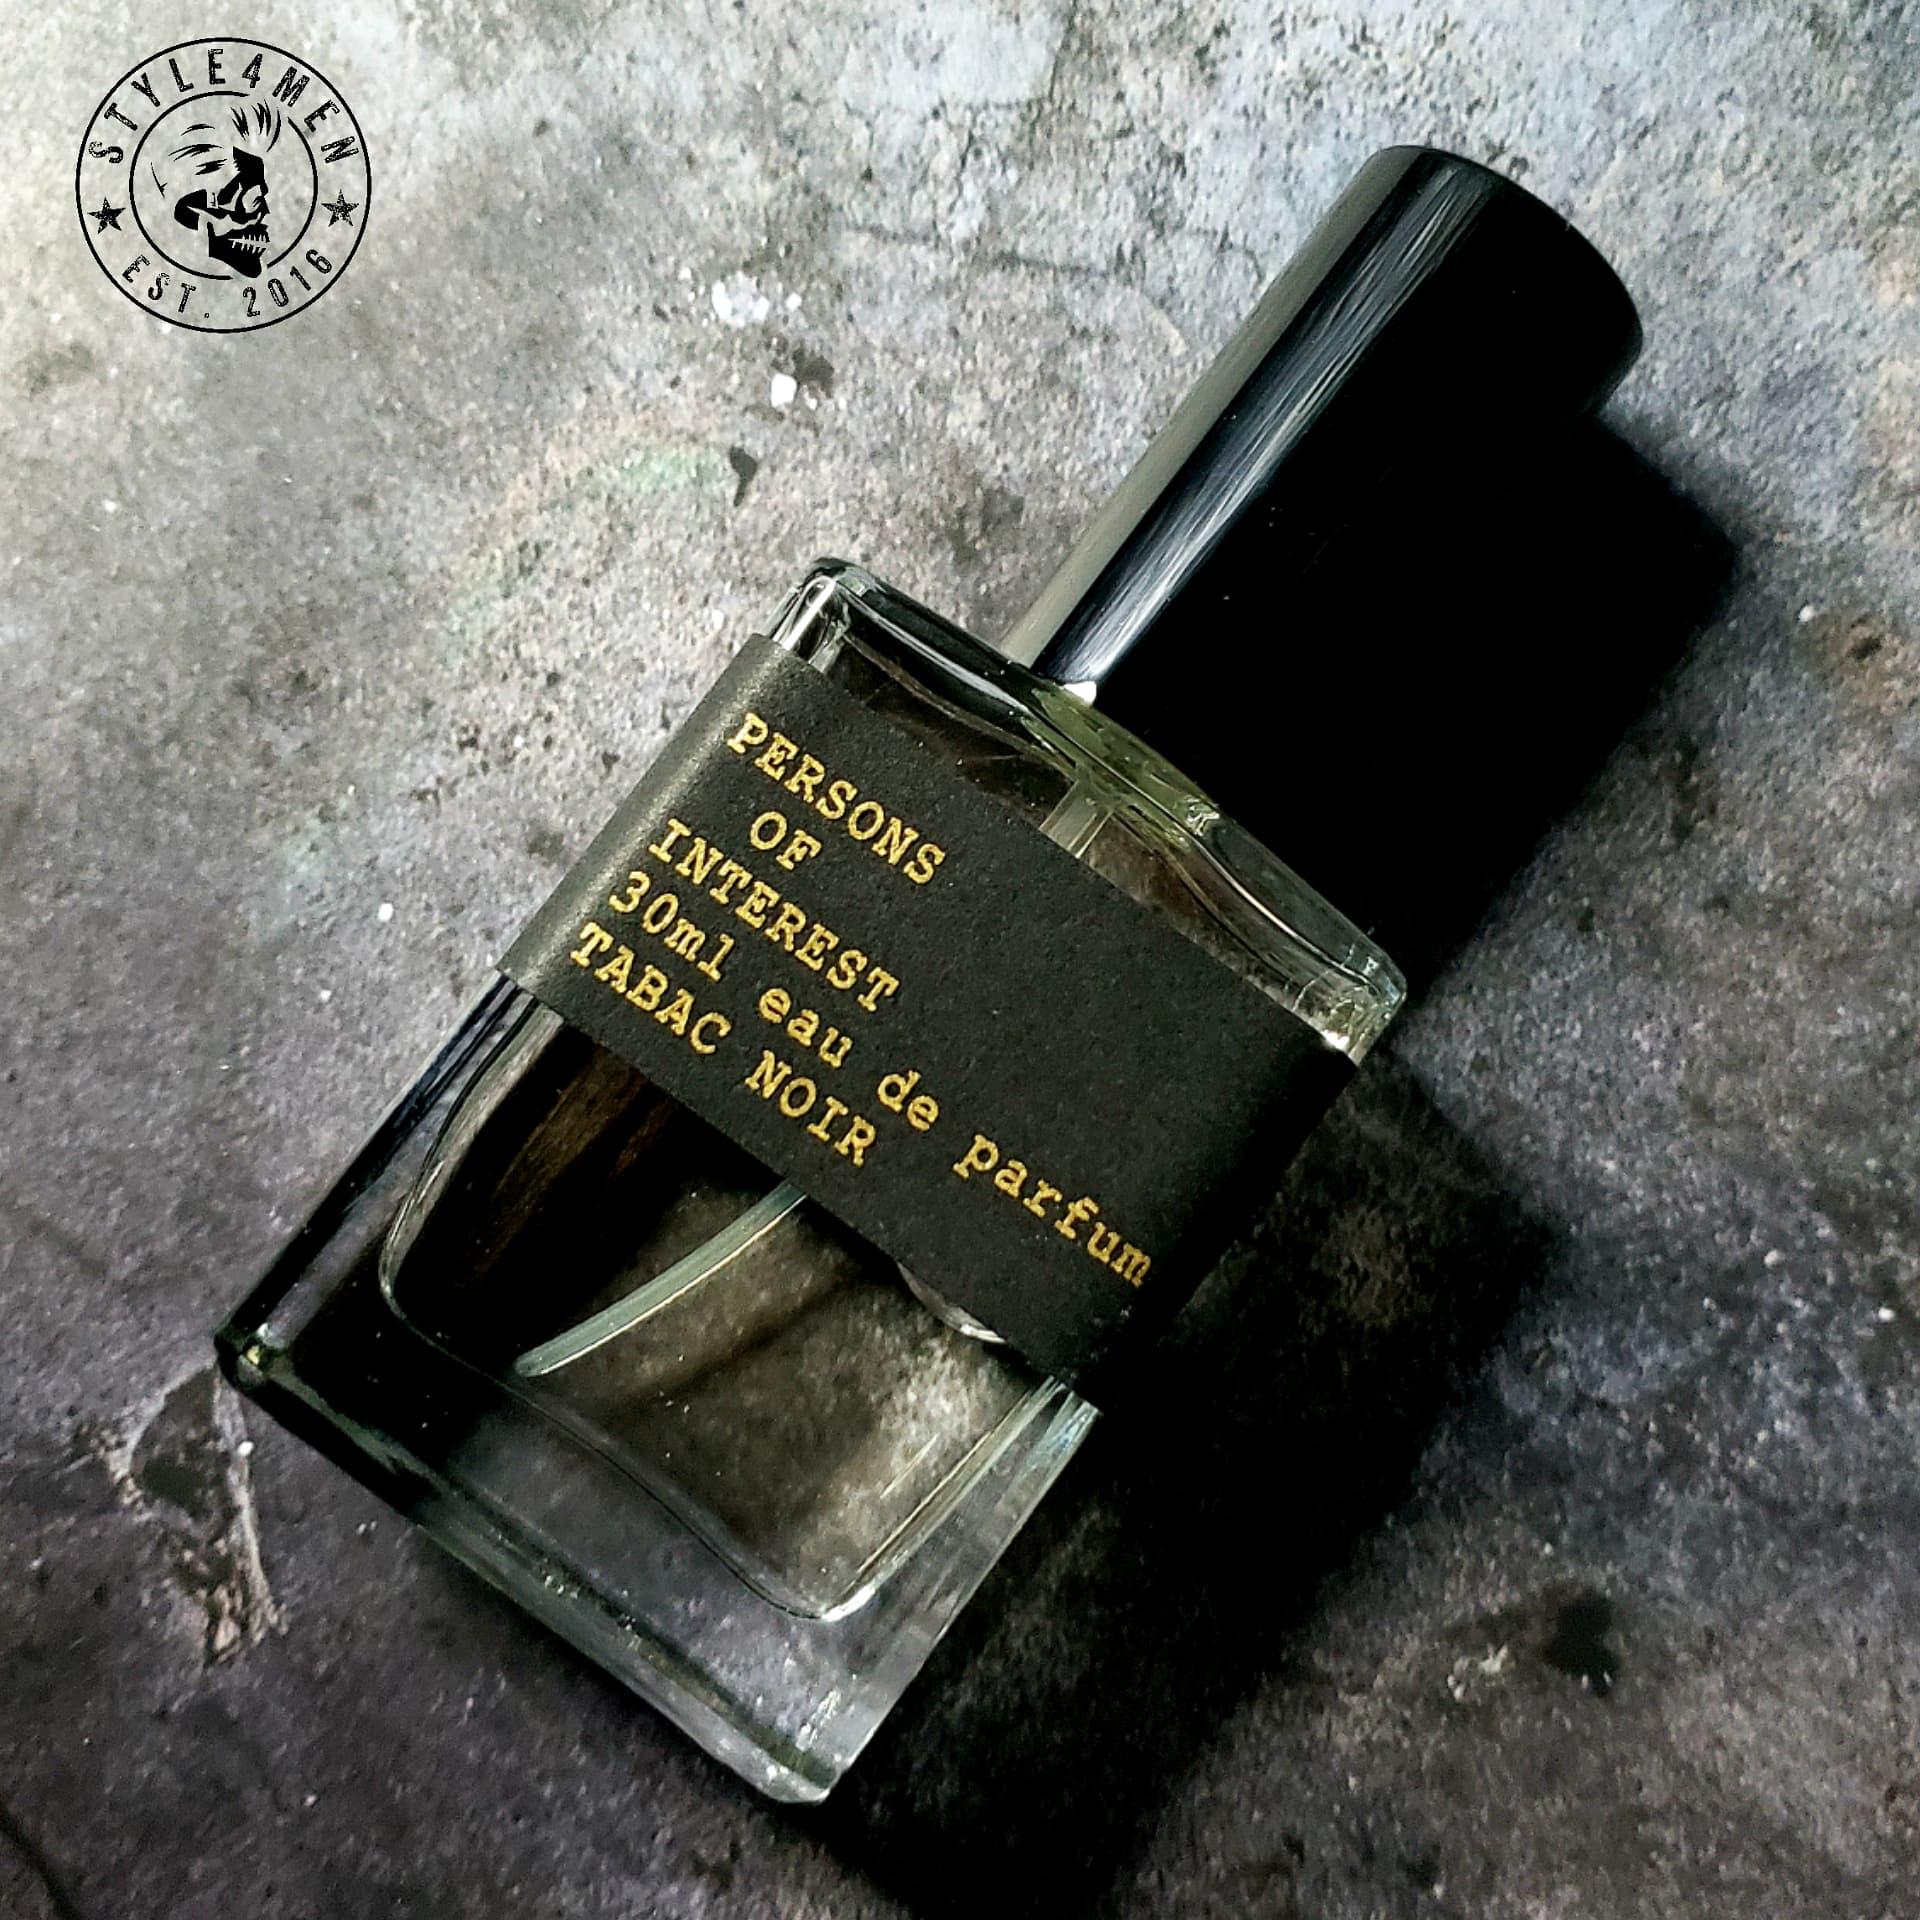 Tabac Noir – An everyday tobacco fragrance